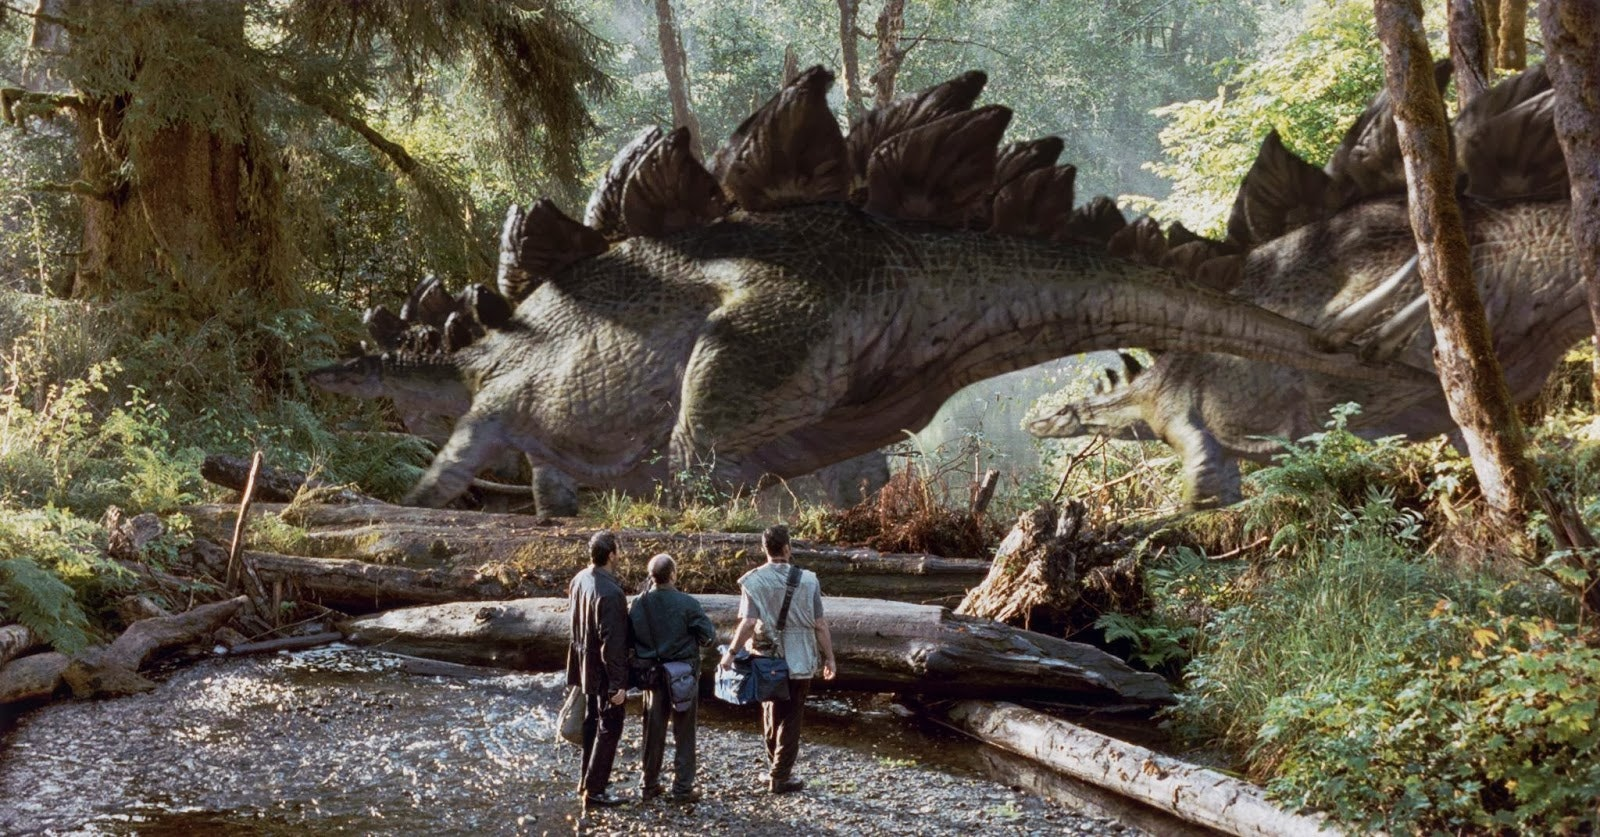 Watch Jurassic World Online Free Full Movie - YouTube